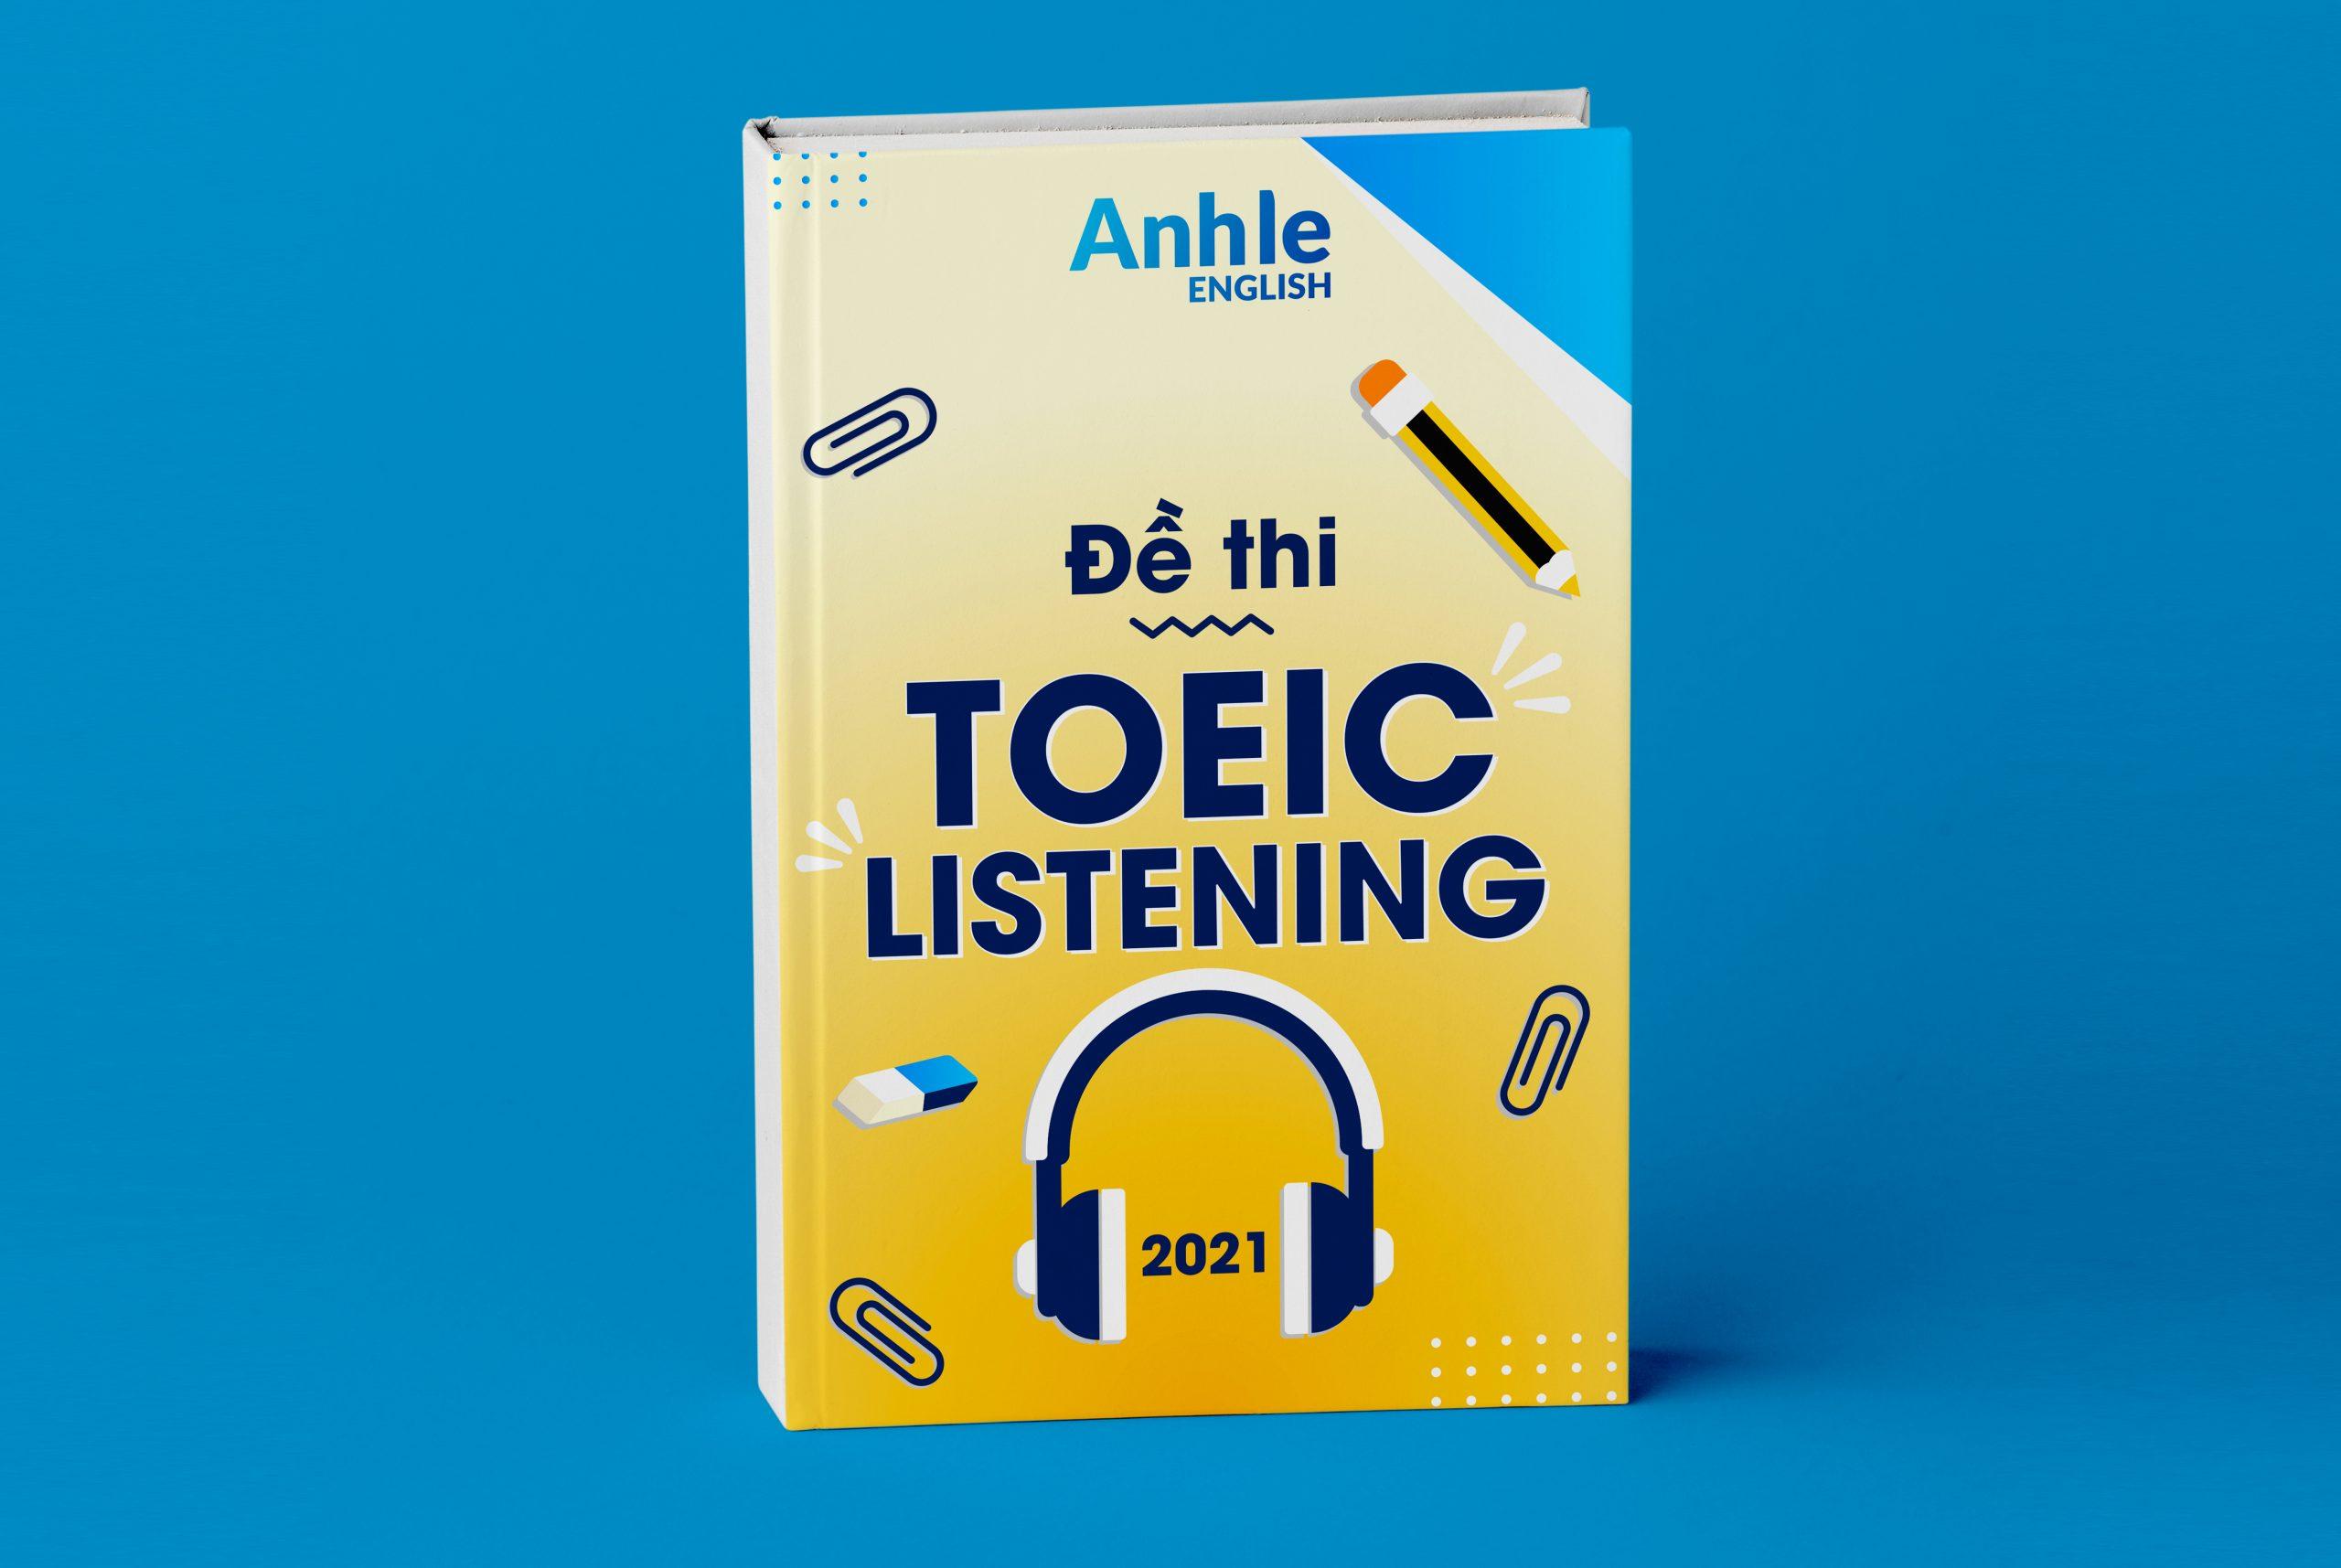 de-thi-toeic-listening-2021